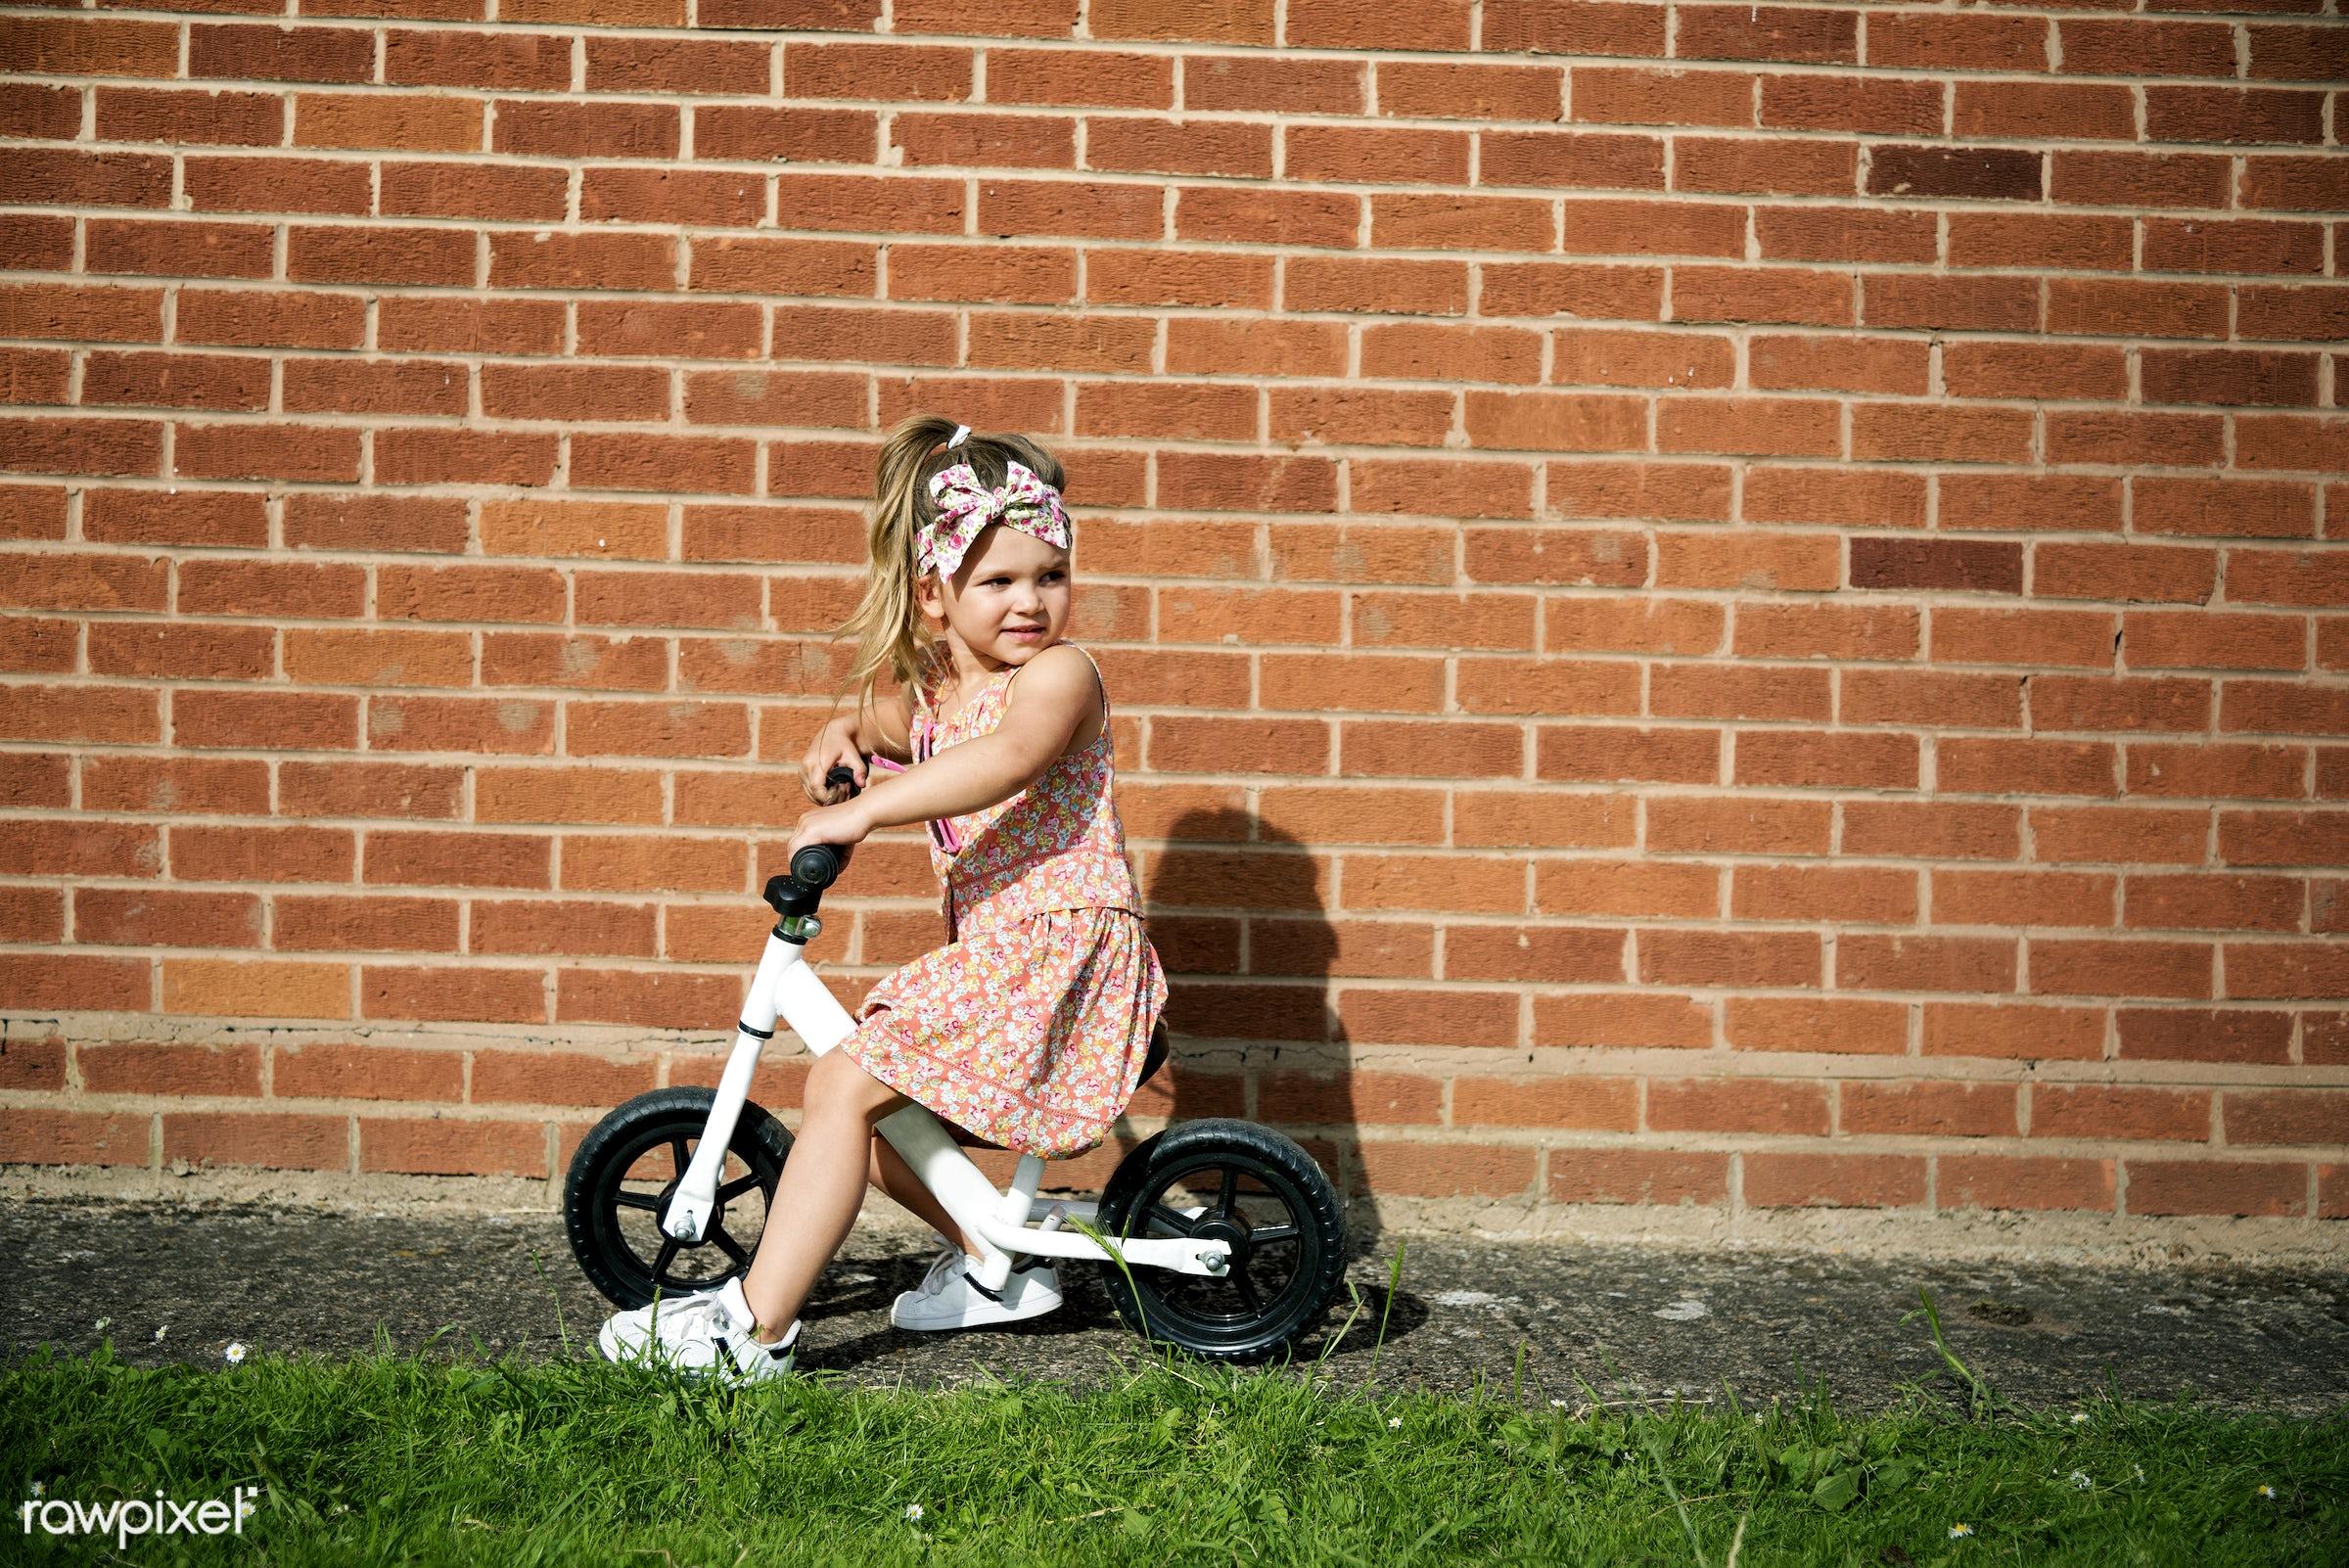 Caucasian children superhero and play shoot - happy, model, person, adorable, beautiful, beauty, bicycle, bike, biking,...